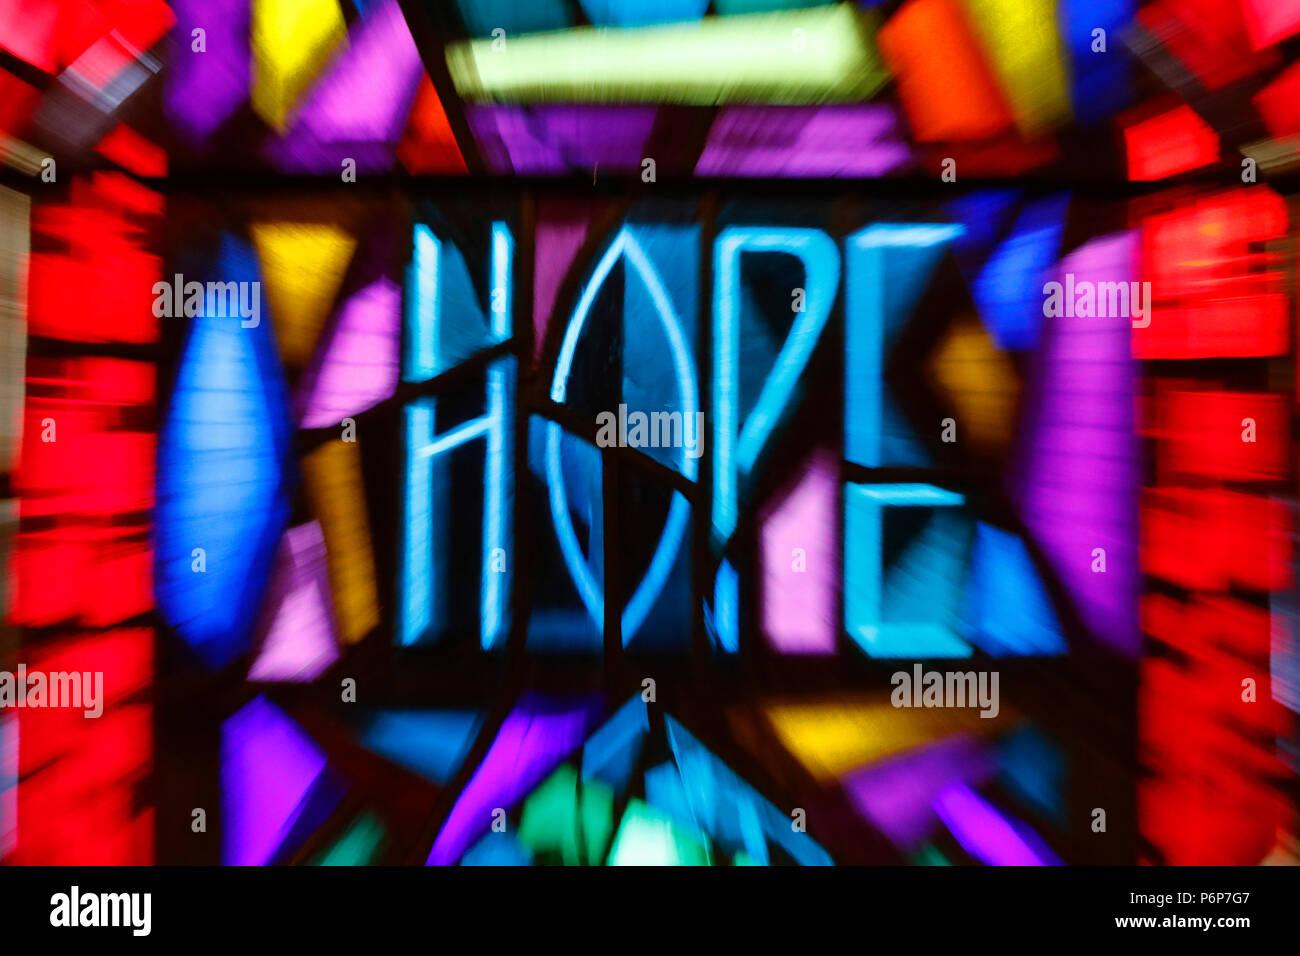 The church of the Holy Trinity.   Stained glass window.  Hope.  Geneva. Switzerland. - Stock Image